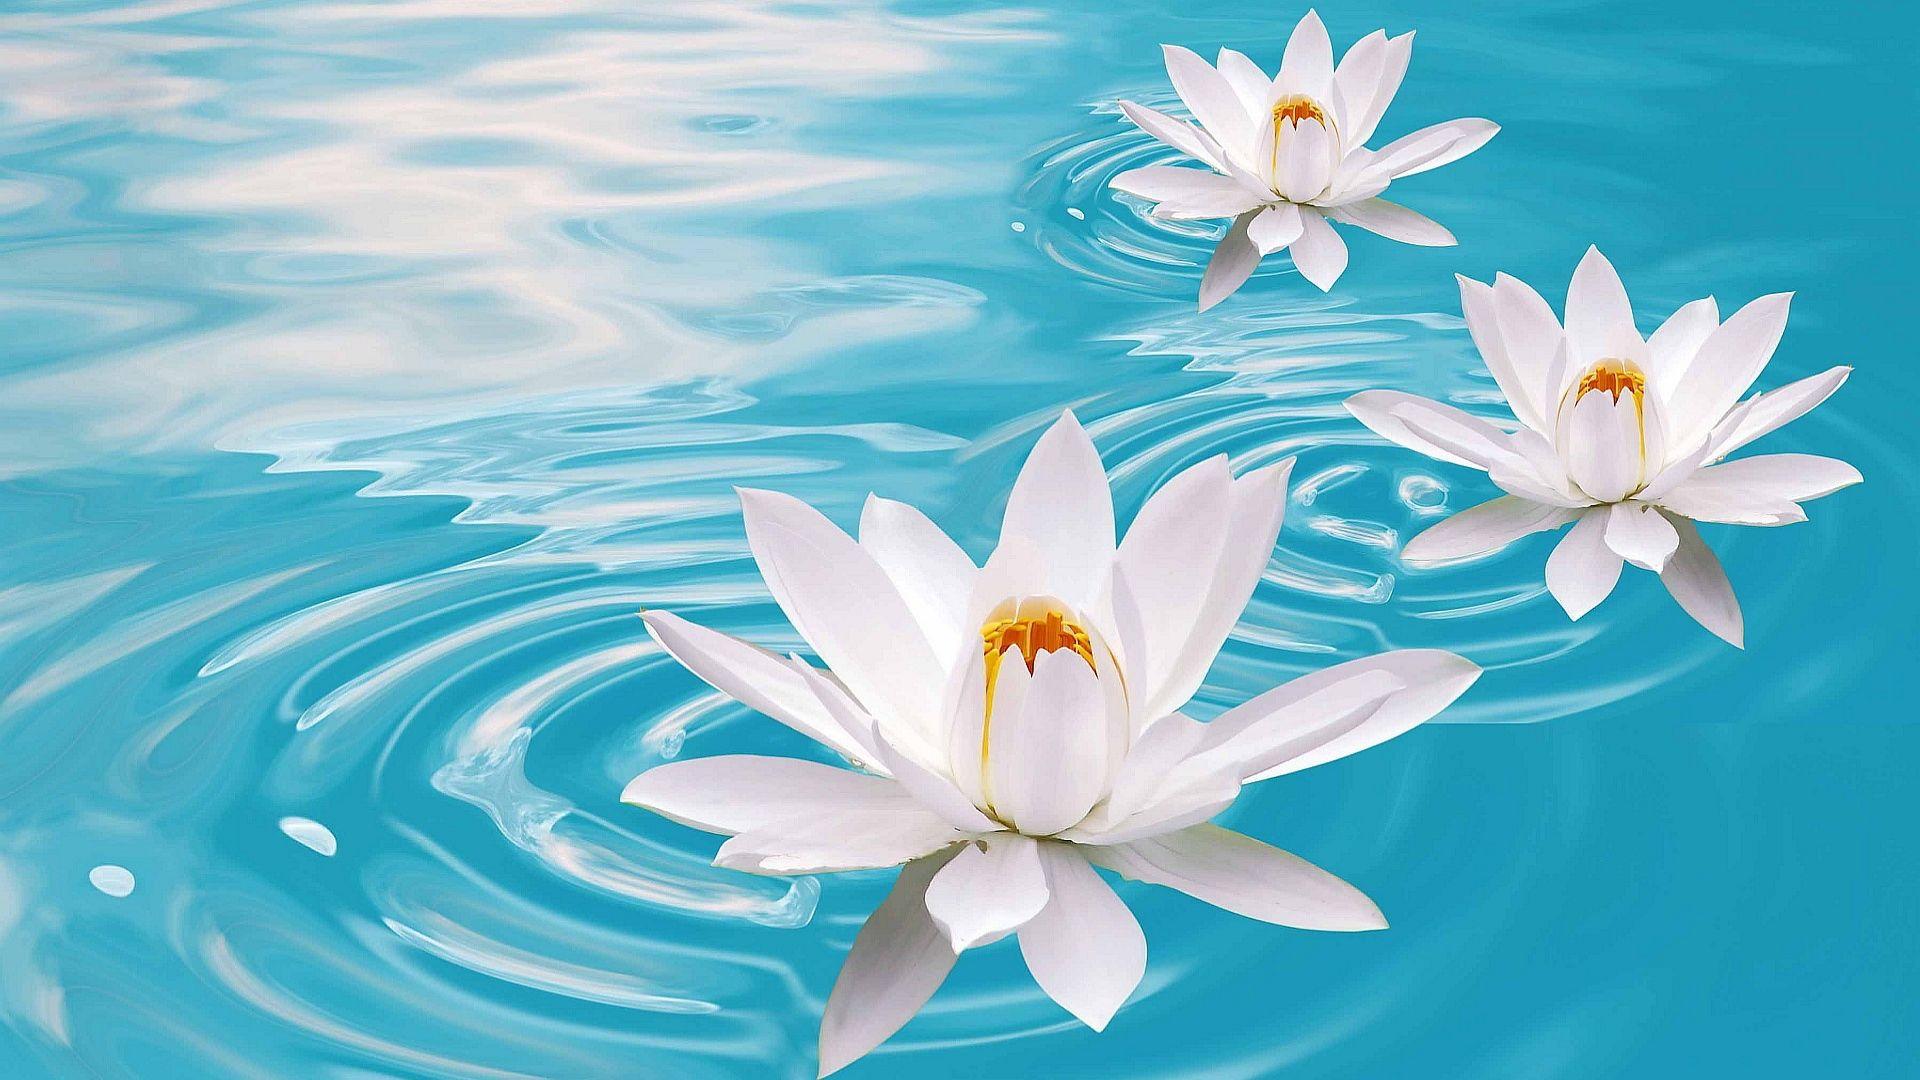 Wallpaper lotus flower water 4k nature 16046 ctrl lotus flower water 4k horizontal mightylinksfo Image collections